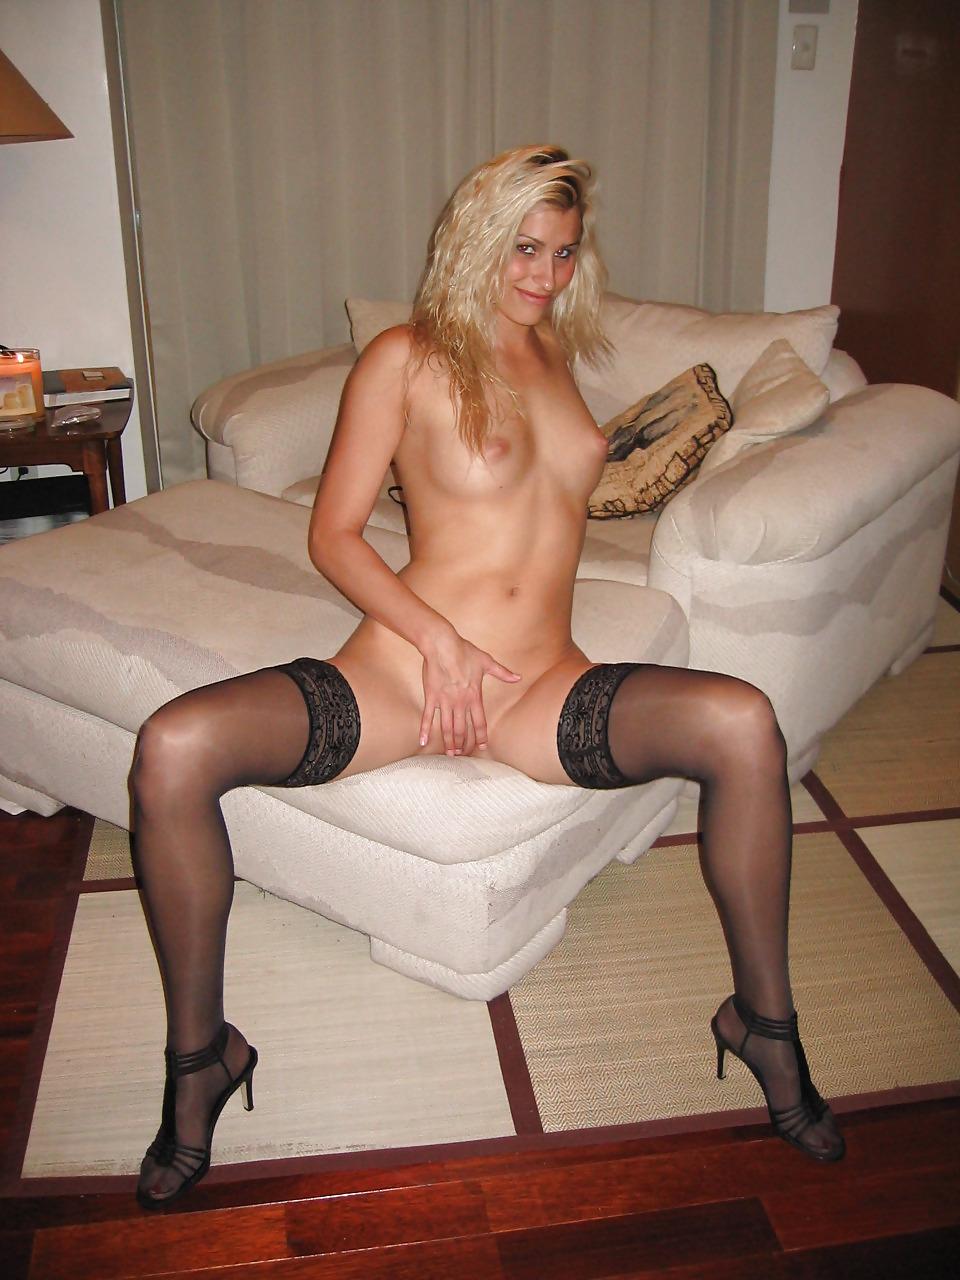 Sunshine pornstar blond amateur stockings sex